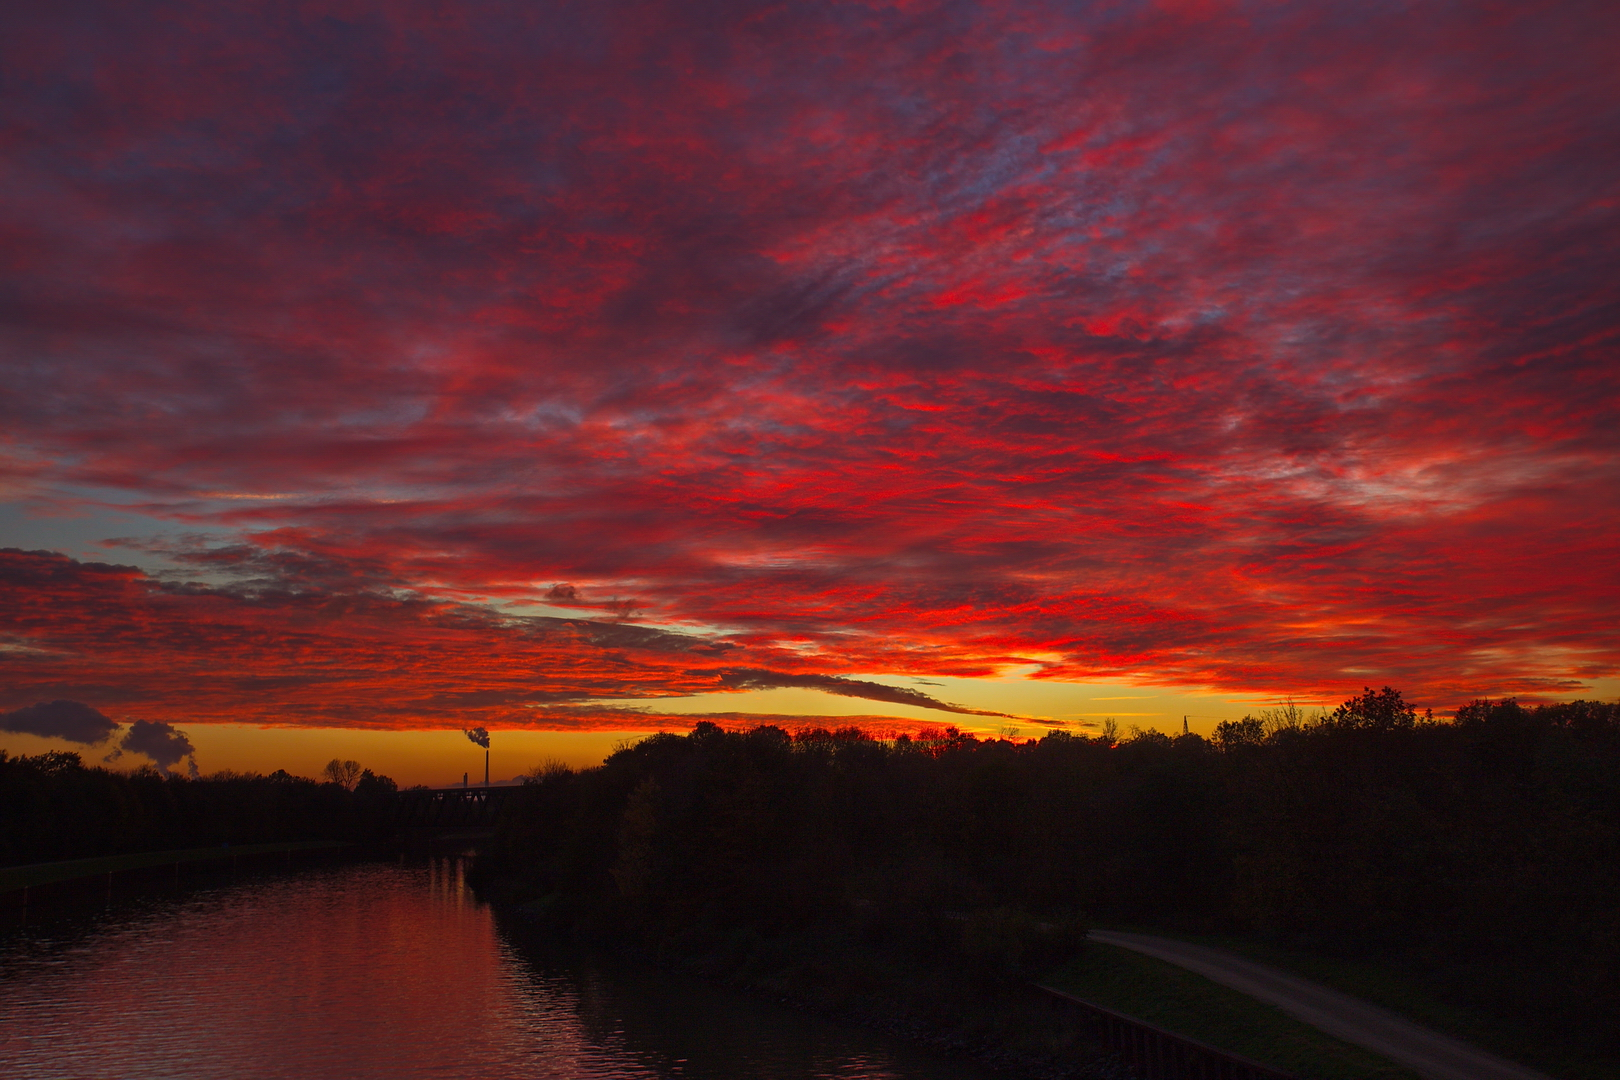 Sonnenuntergang im November 2020 in Haltern Bossendorf.